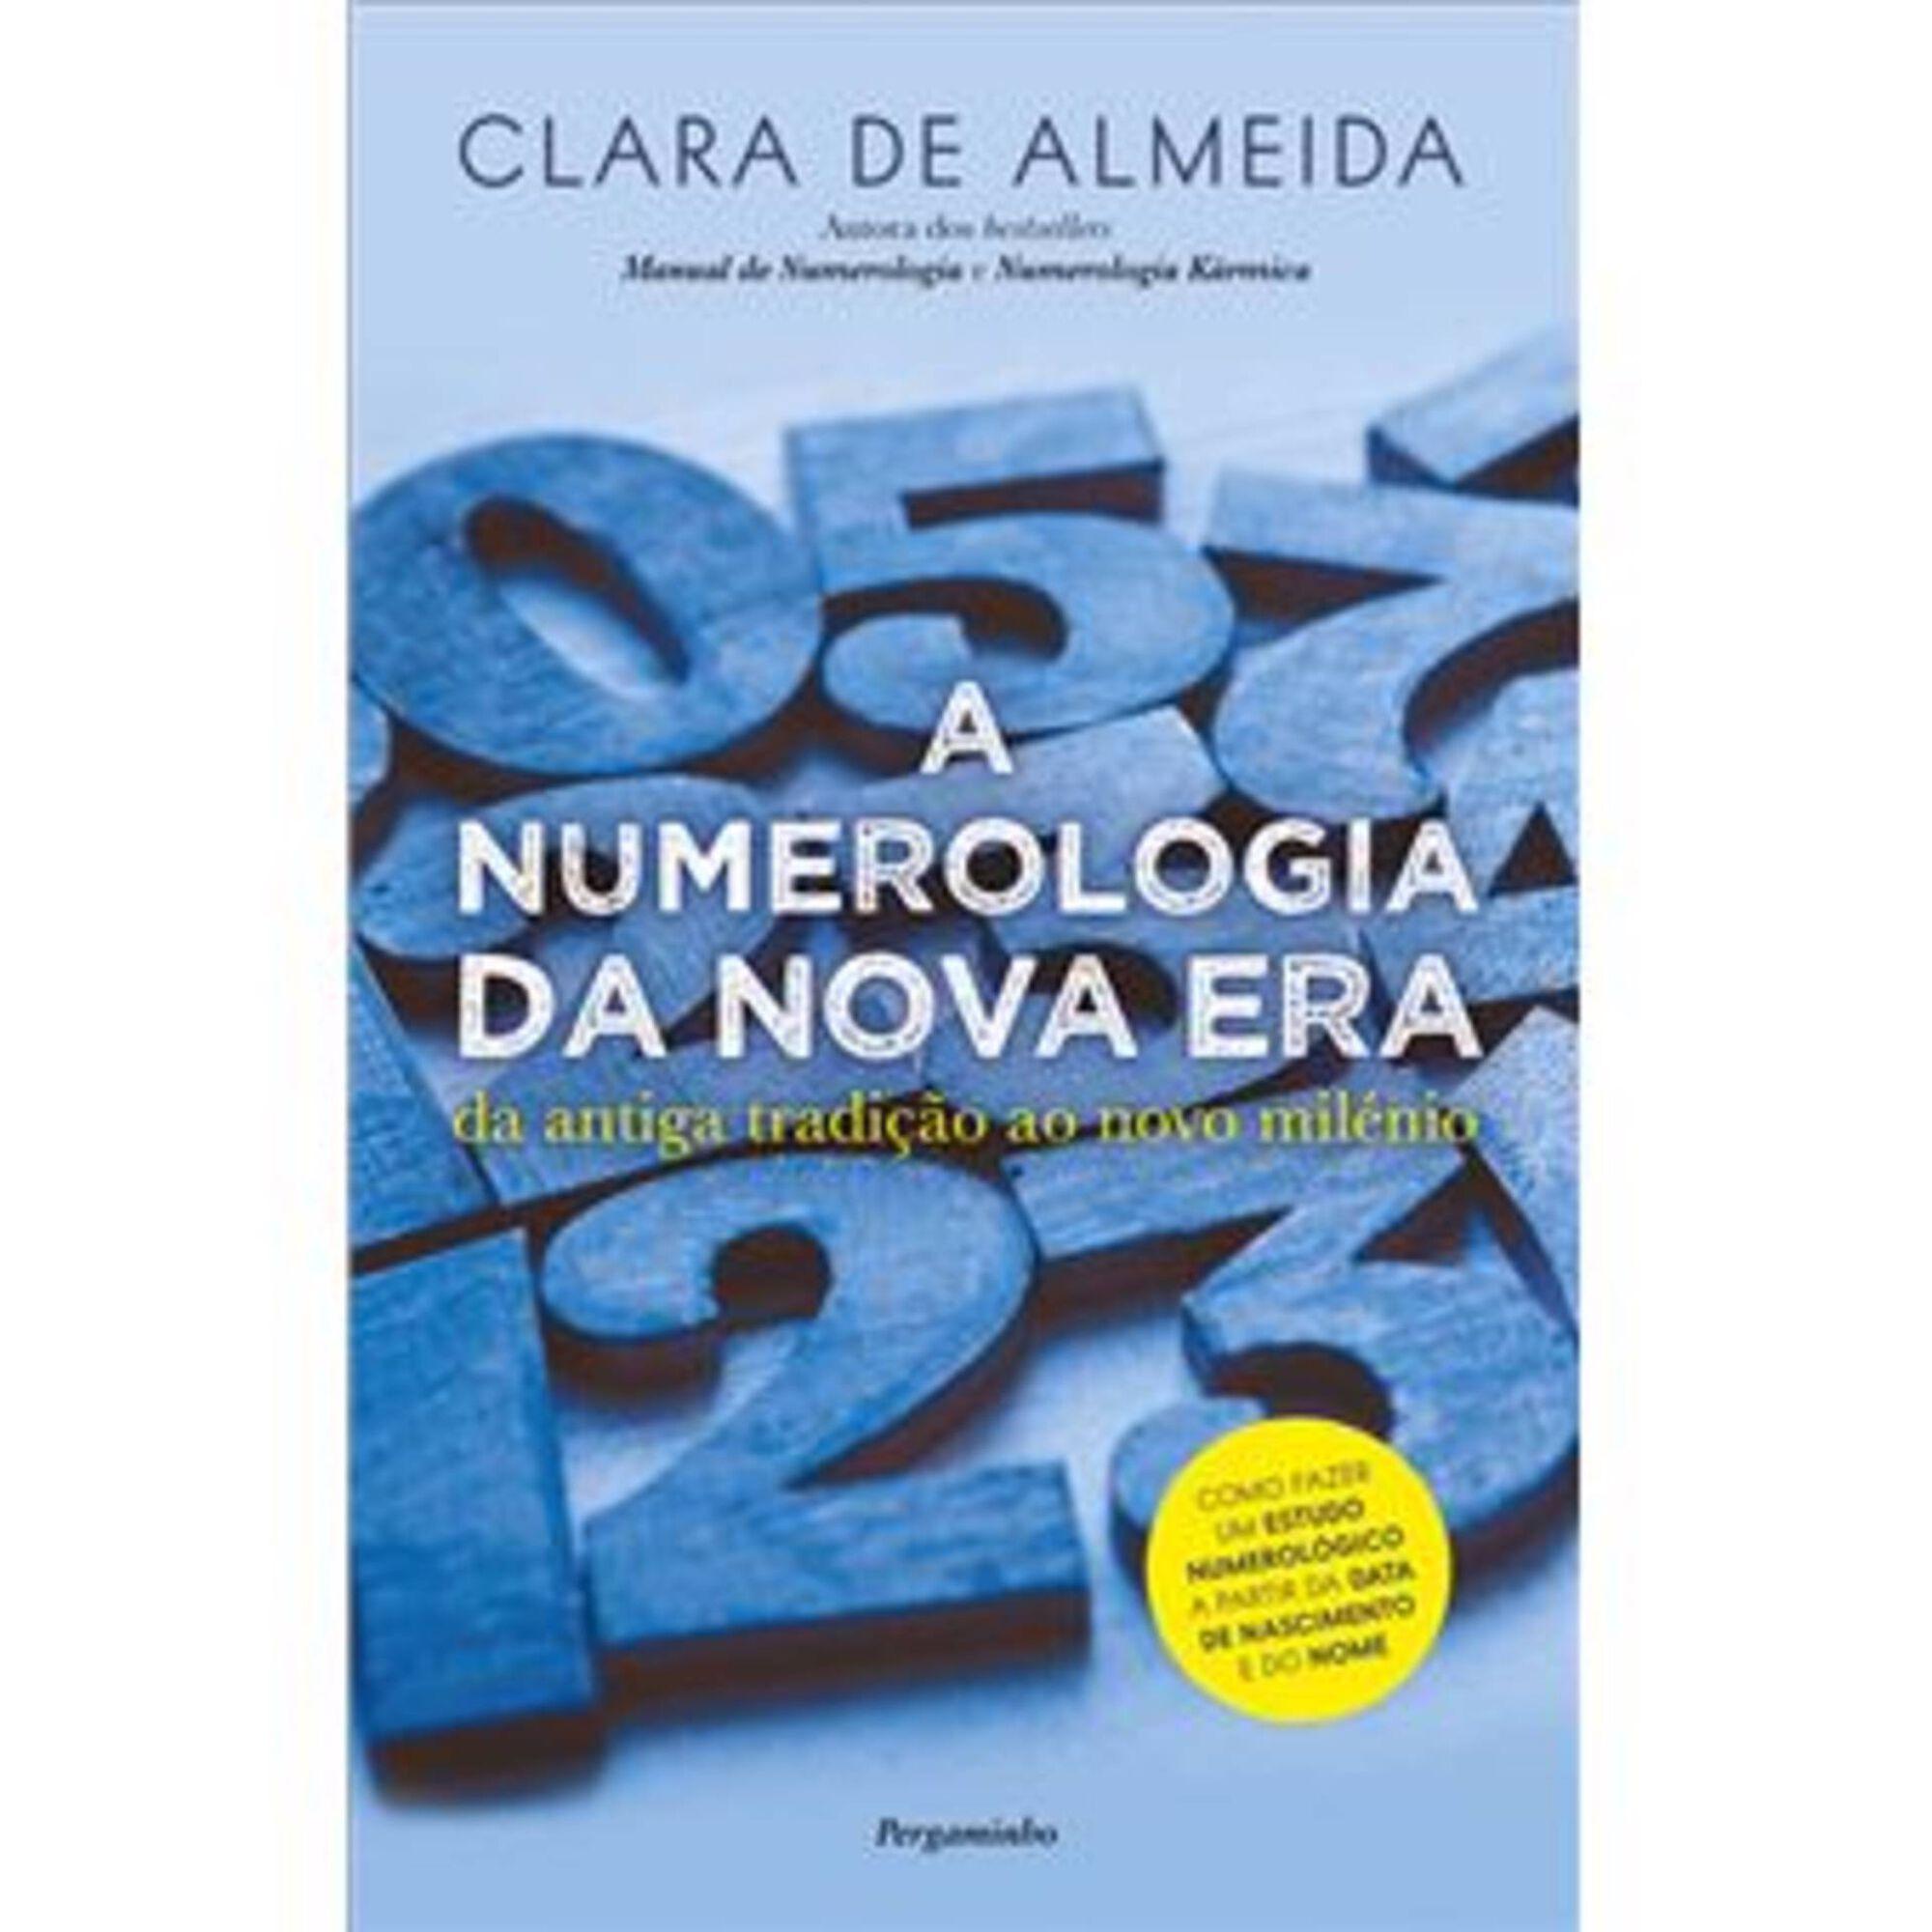 A Numerologia da Nova Era